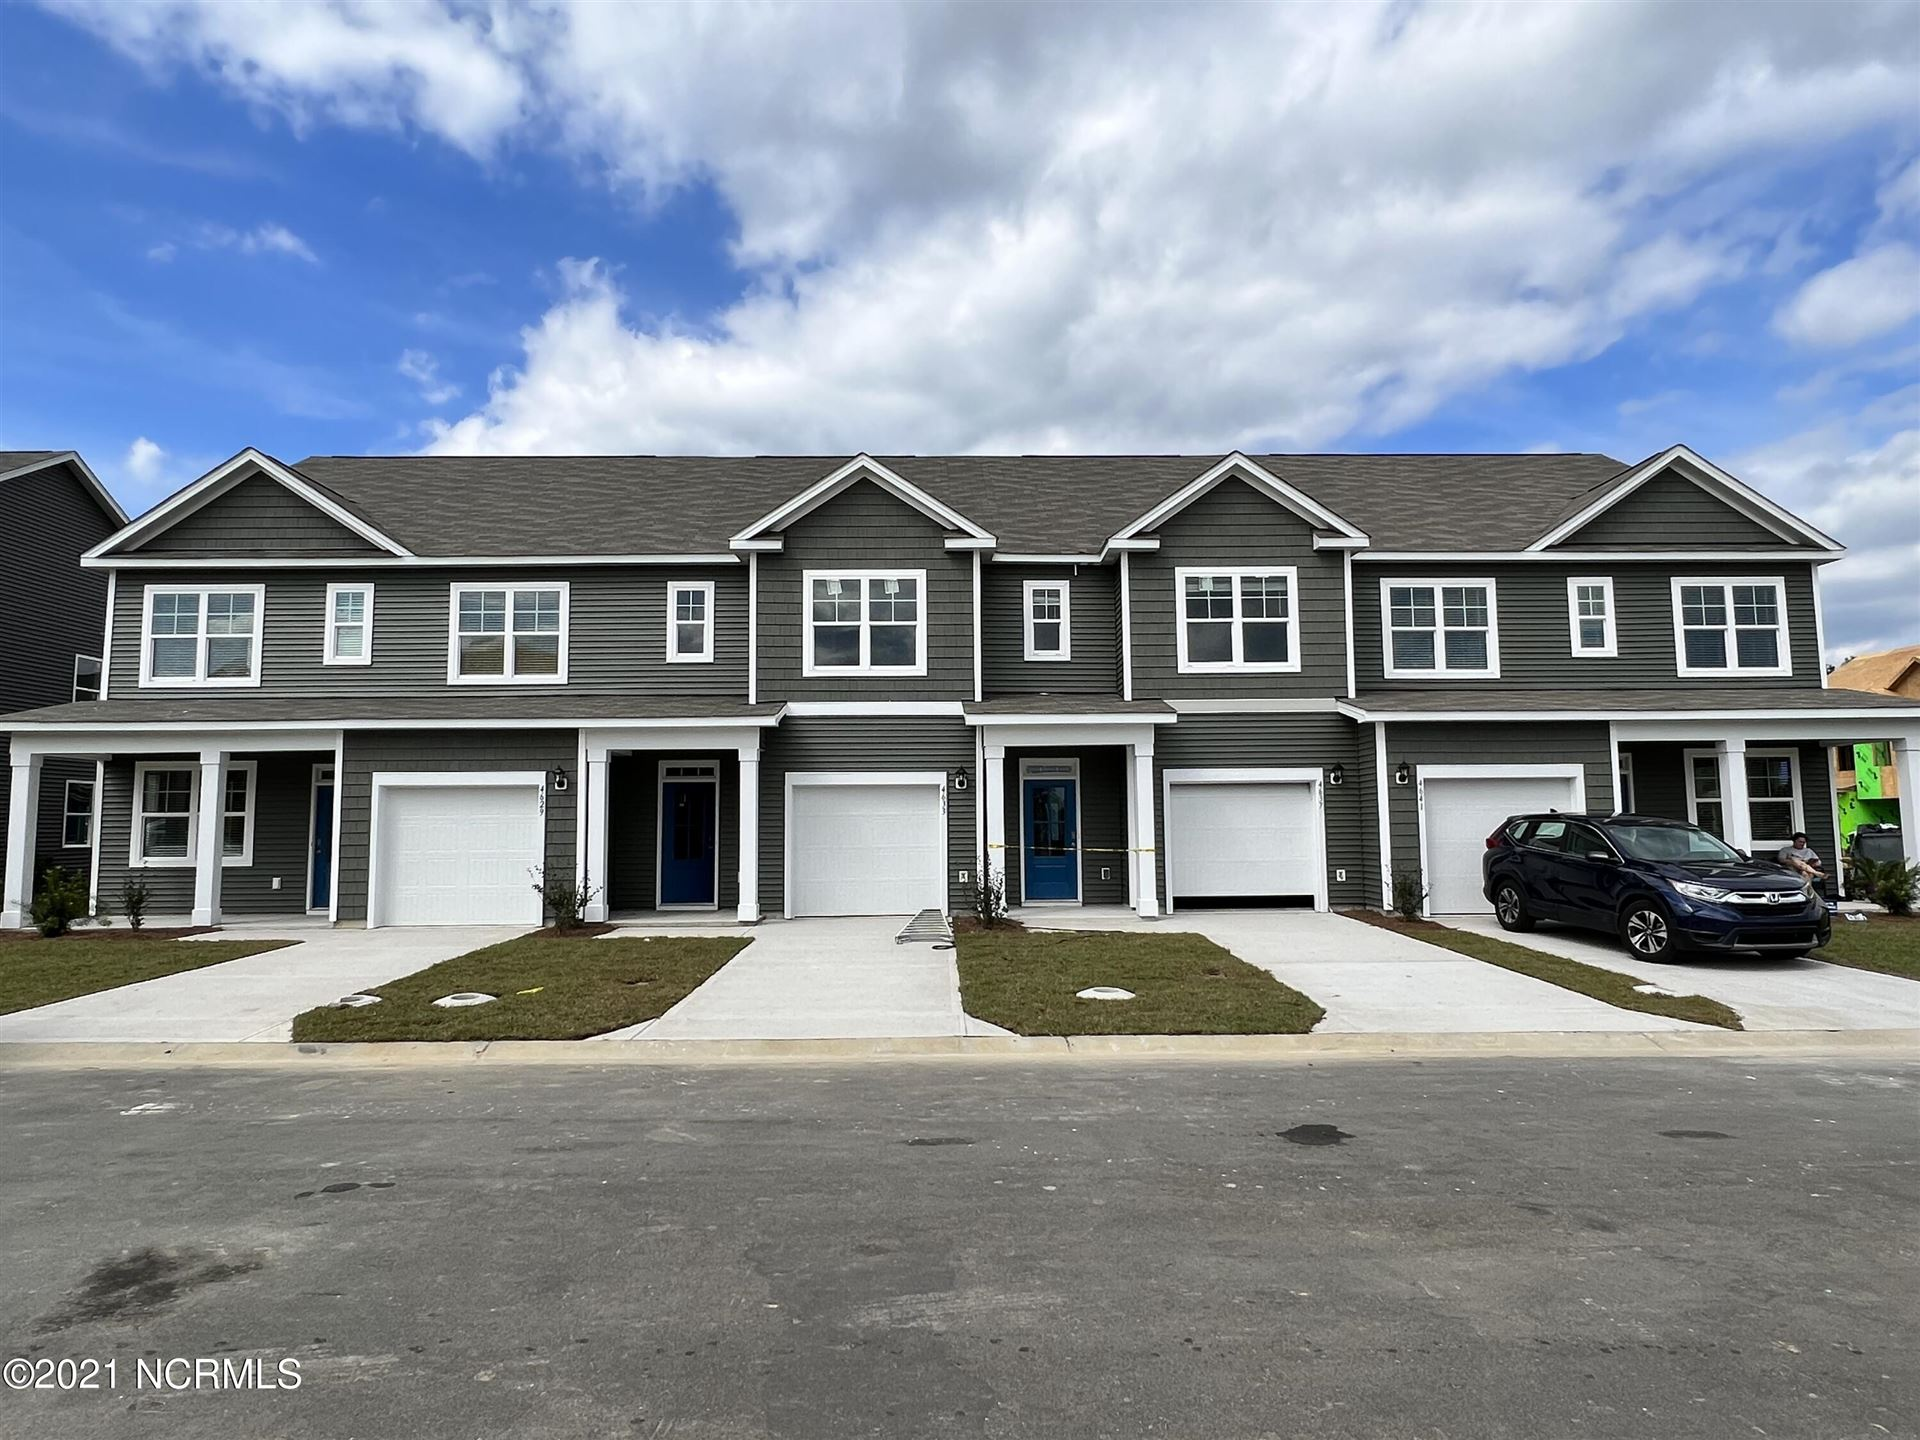 Photo of 7630 Knightbell Circle #Lot 43, Leland, NC 28451 (MLS # 100278420)